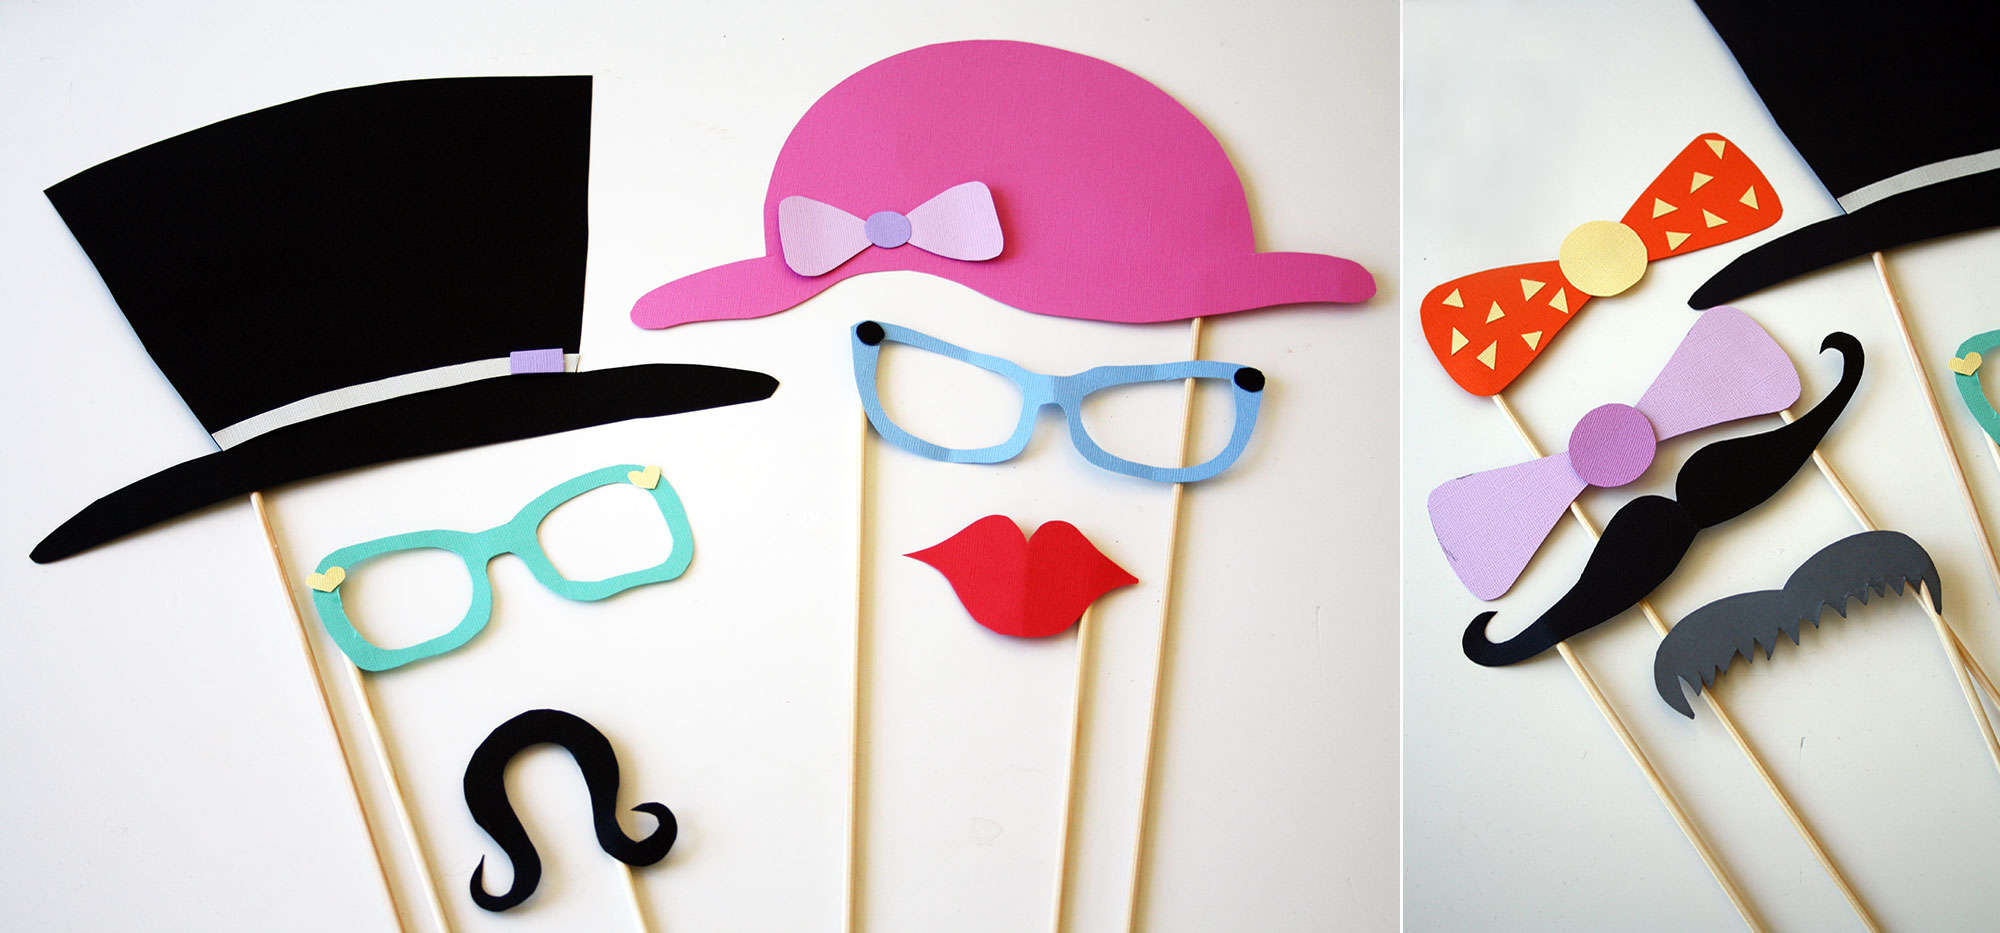 partypinnar-monica-karlstein-hemmafix-photo-booth-kit-wedding-party.tillbehor-props-sverige